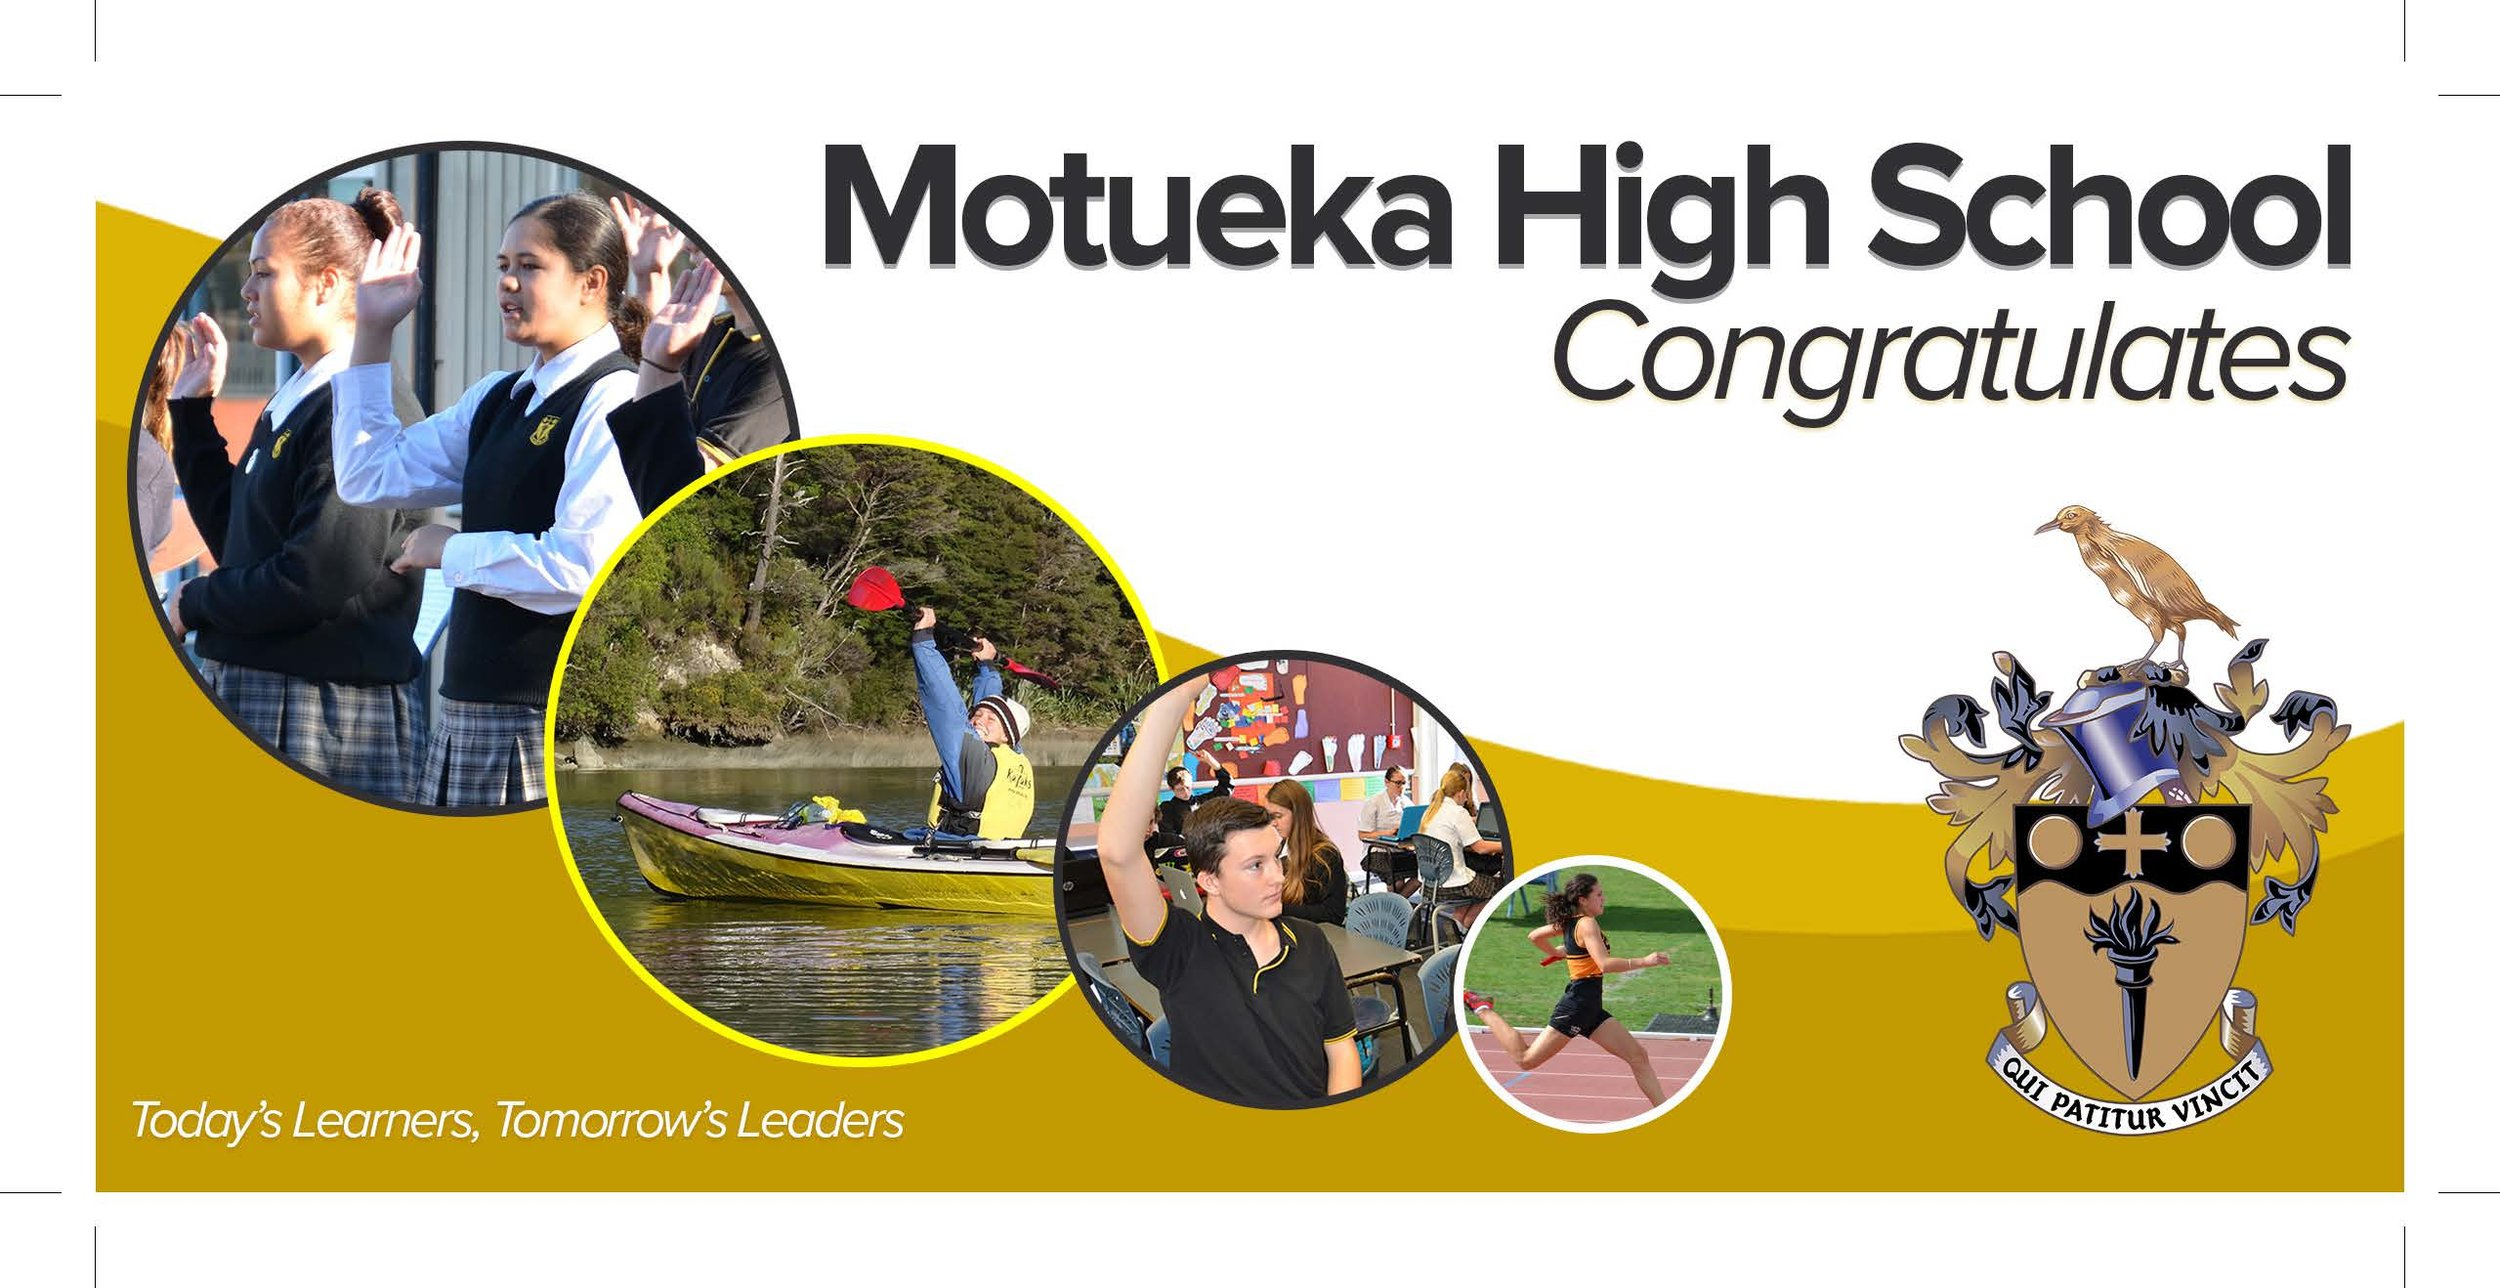 Redevelopment of Motueka High School identity design